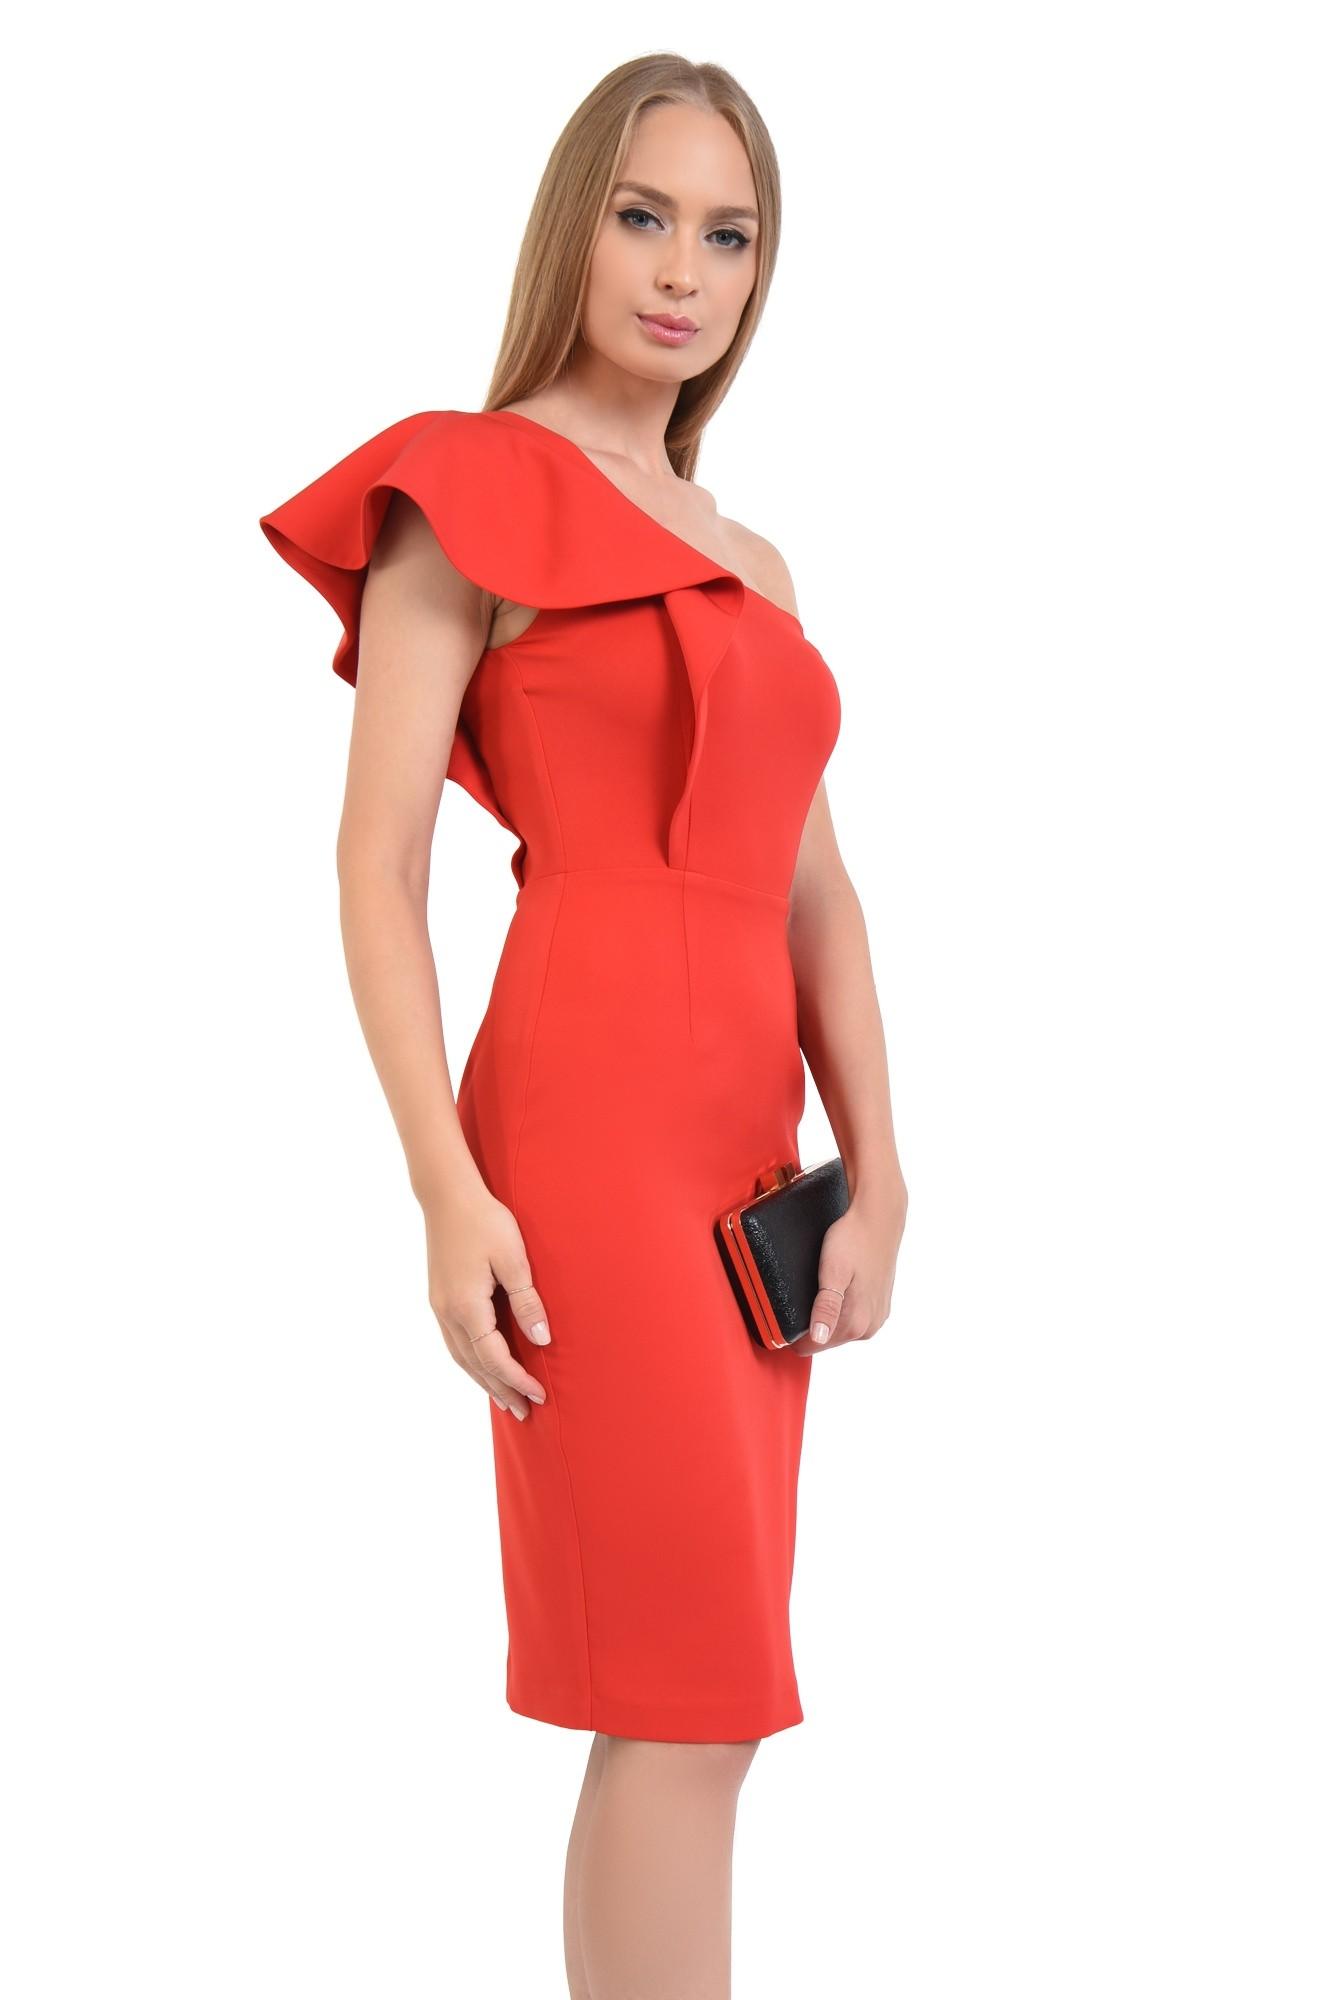 rochie de ocazie, cambrata, slit la spate, rochii online